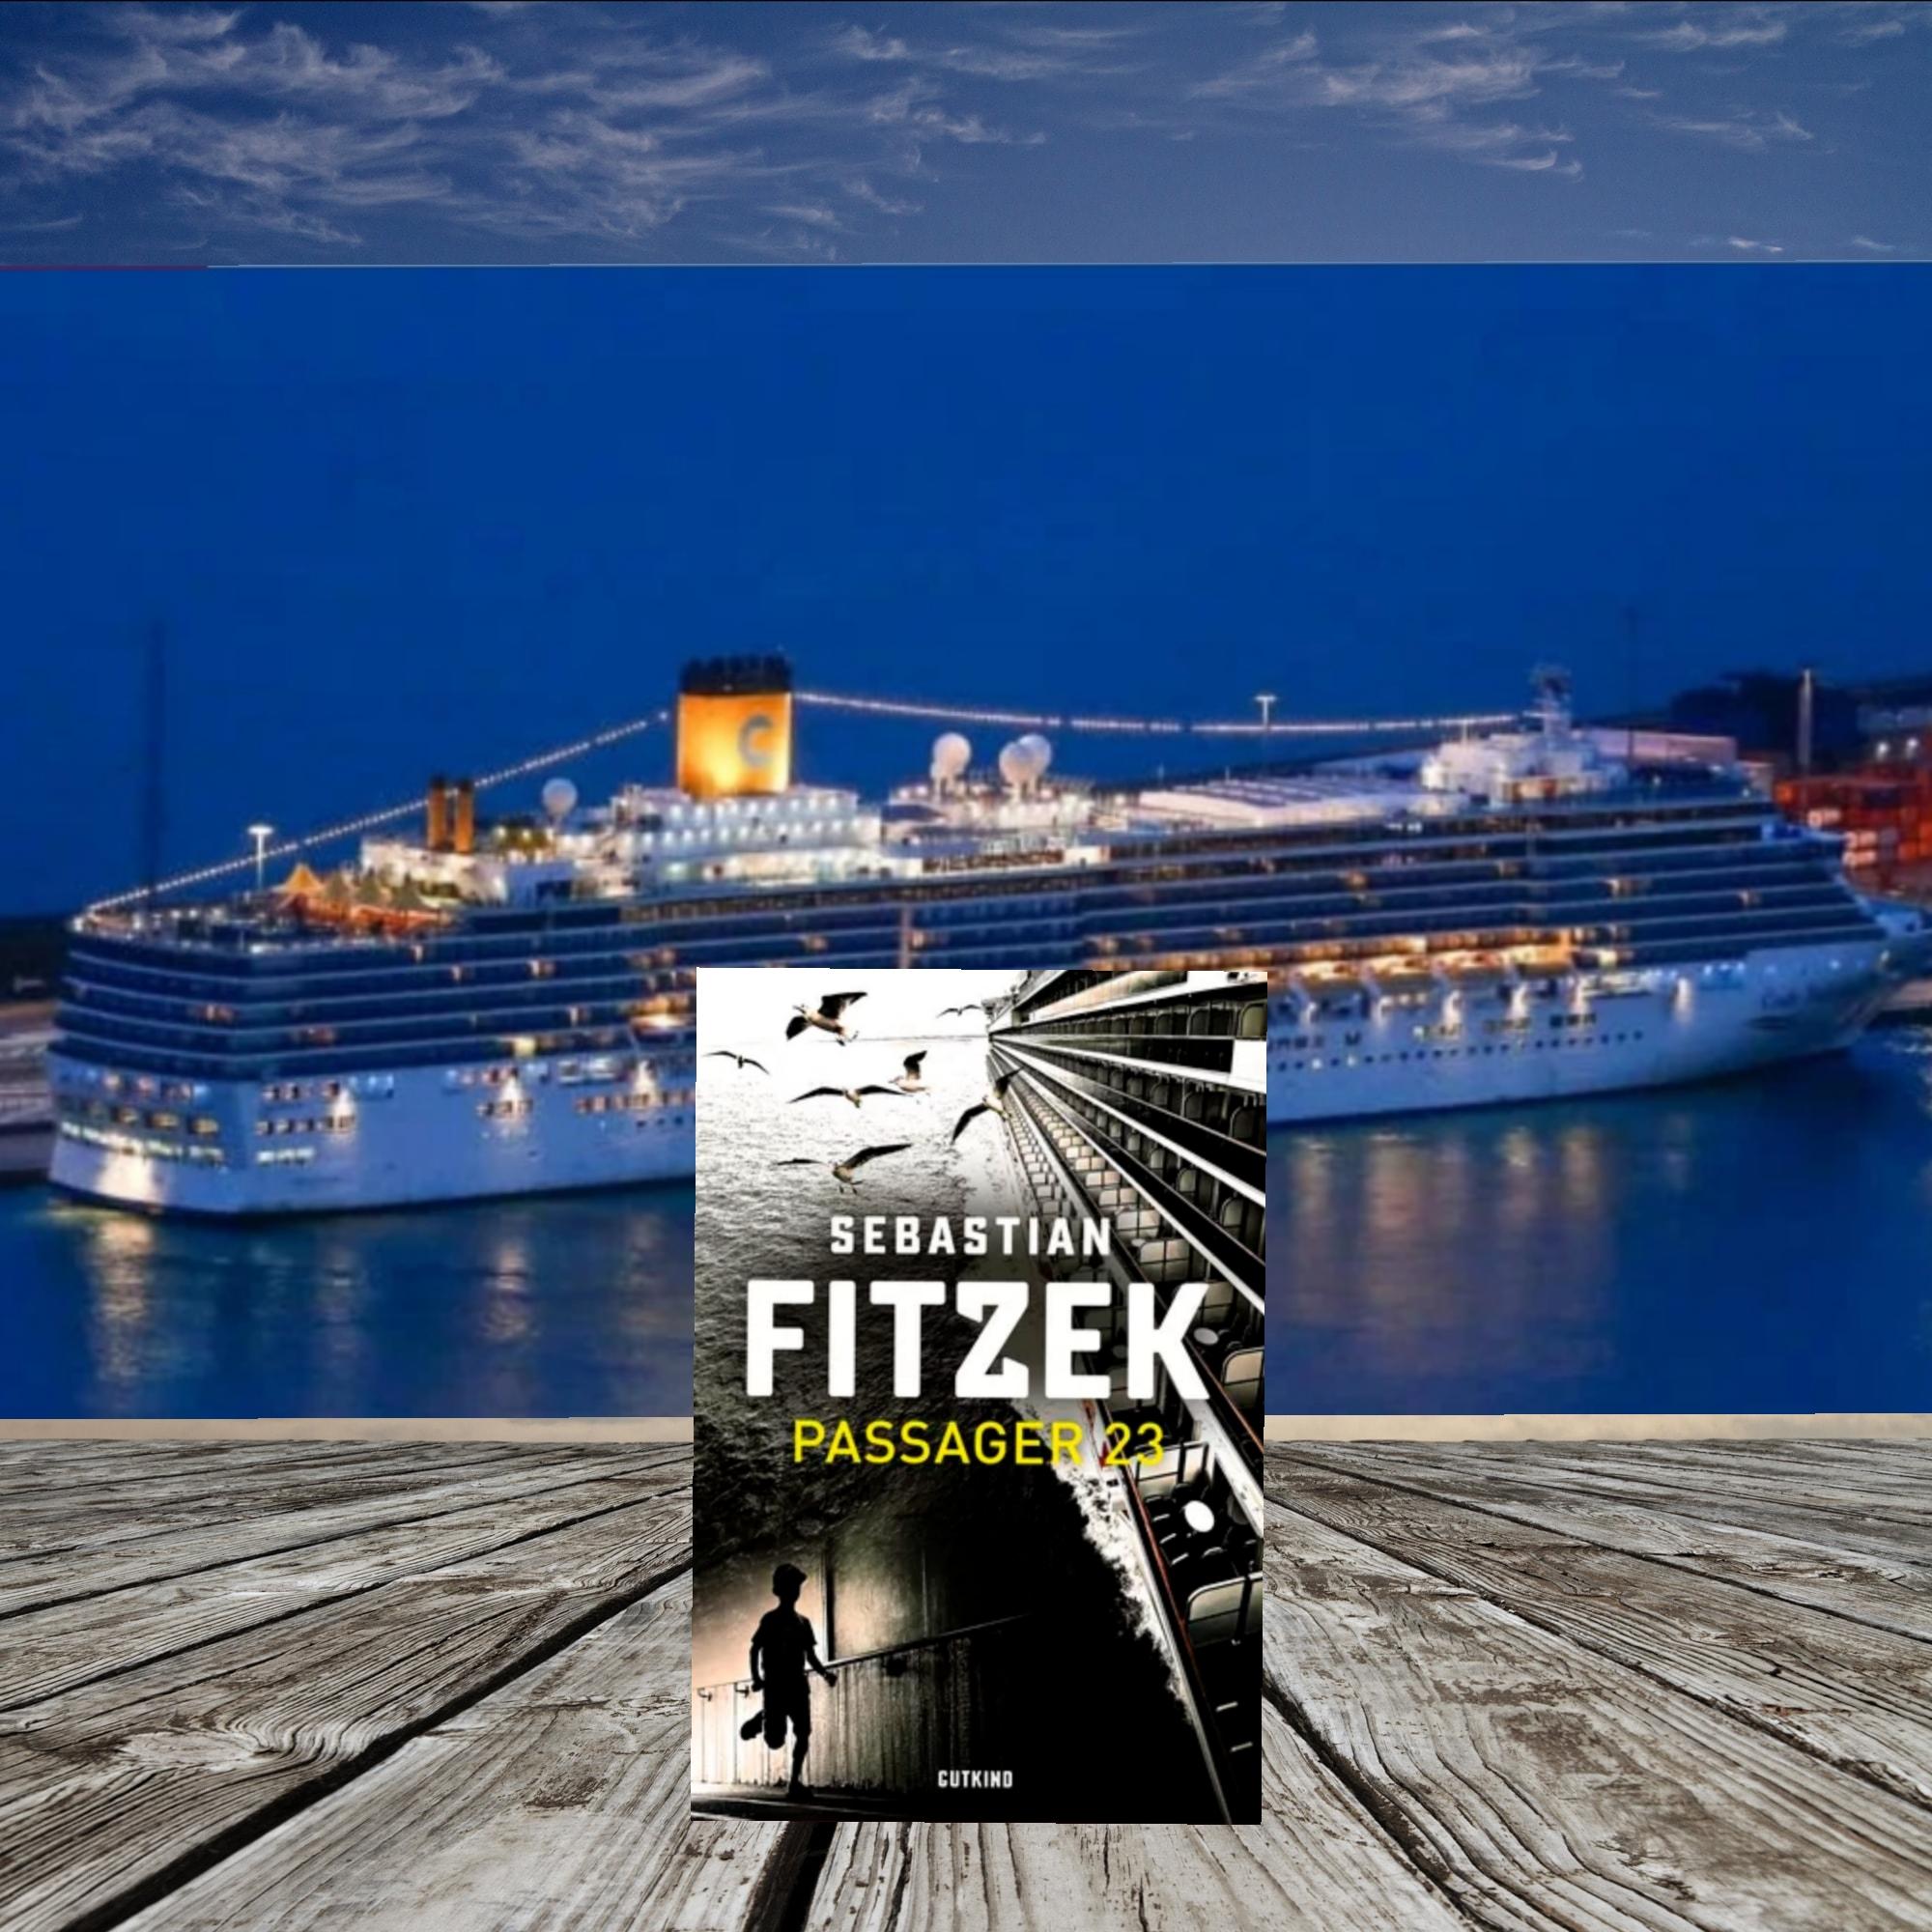 Passager 23 af Sebastian Fitzek